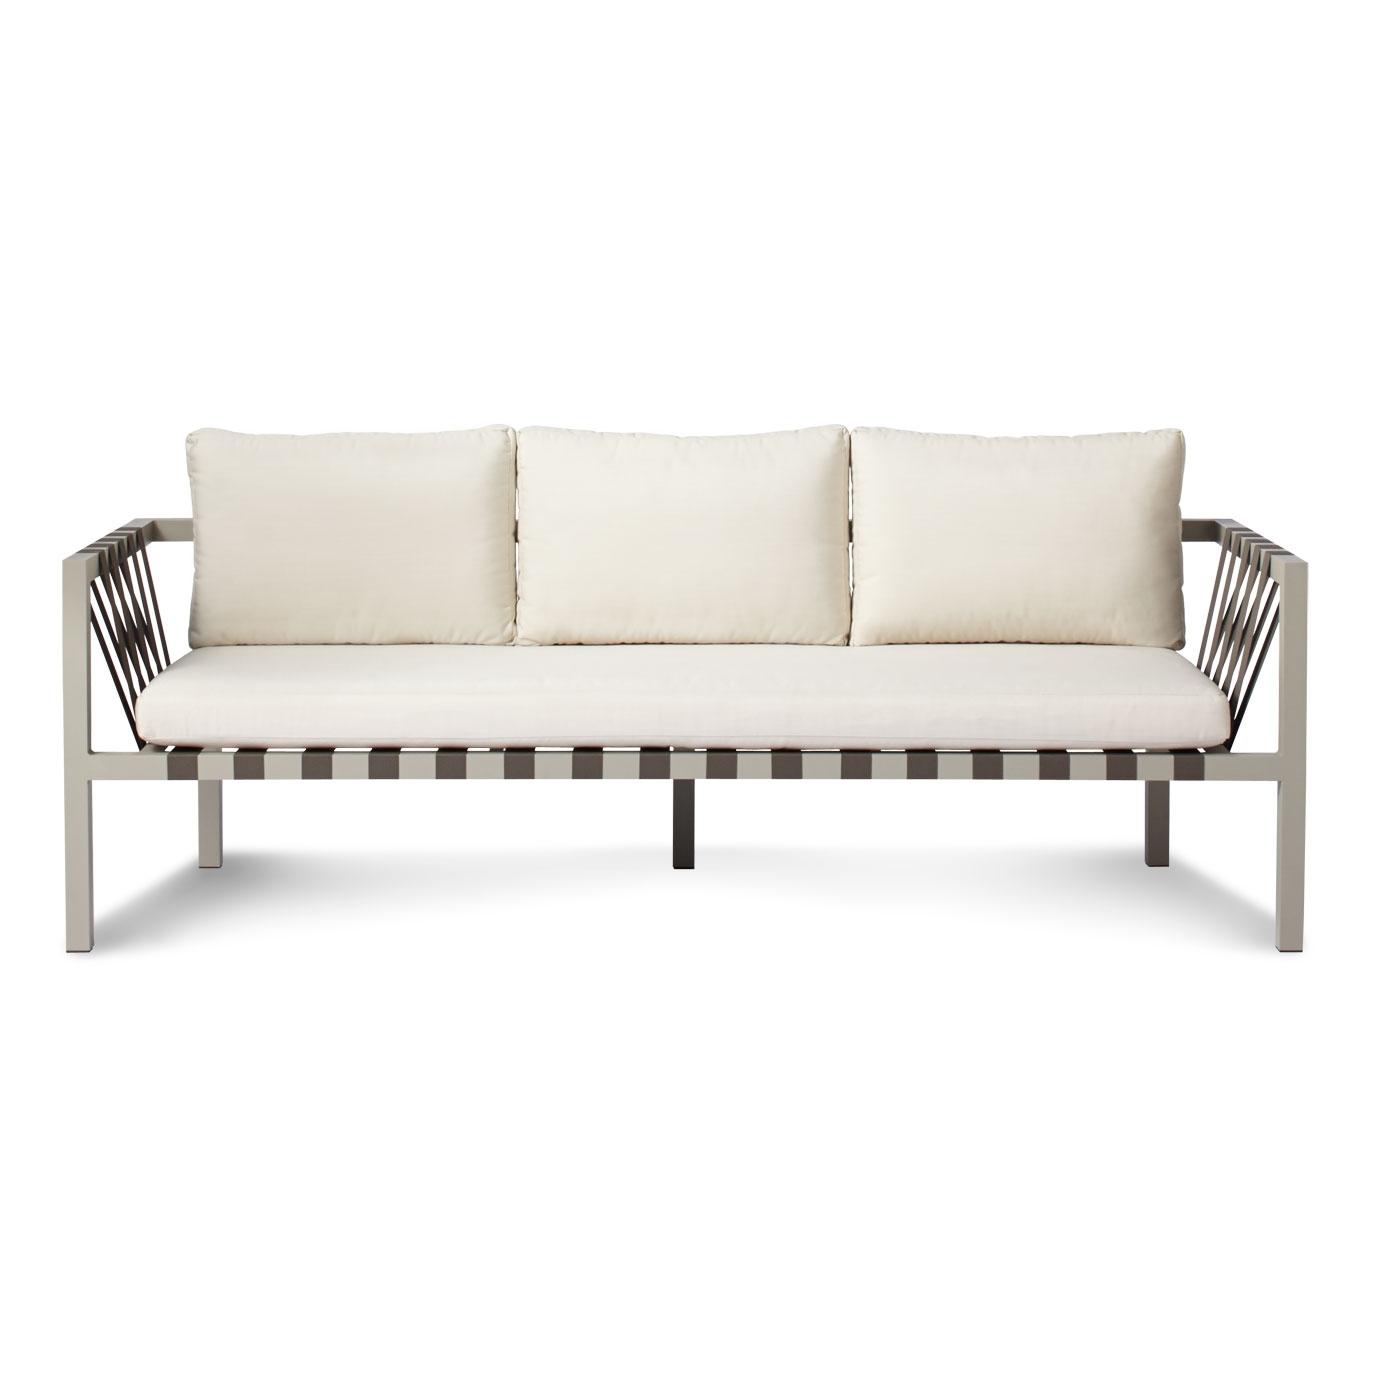 Modern 3 Seater Sofas Regarding Trendy Jibe Outdoor 3 Seat Sofa – Modern Outdoor Sofas (View 14 of 15)